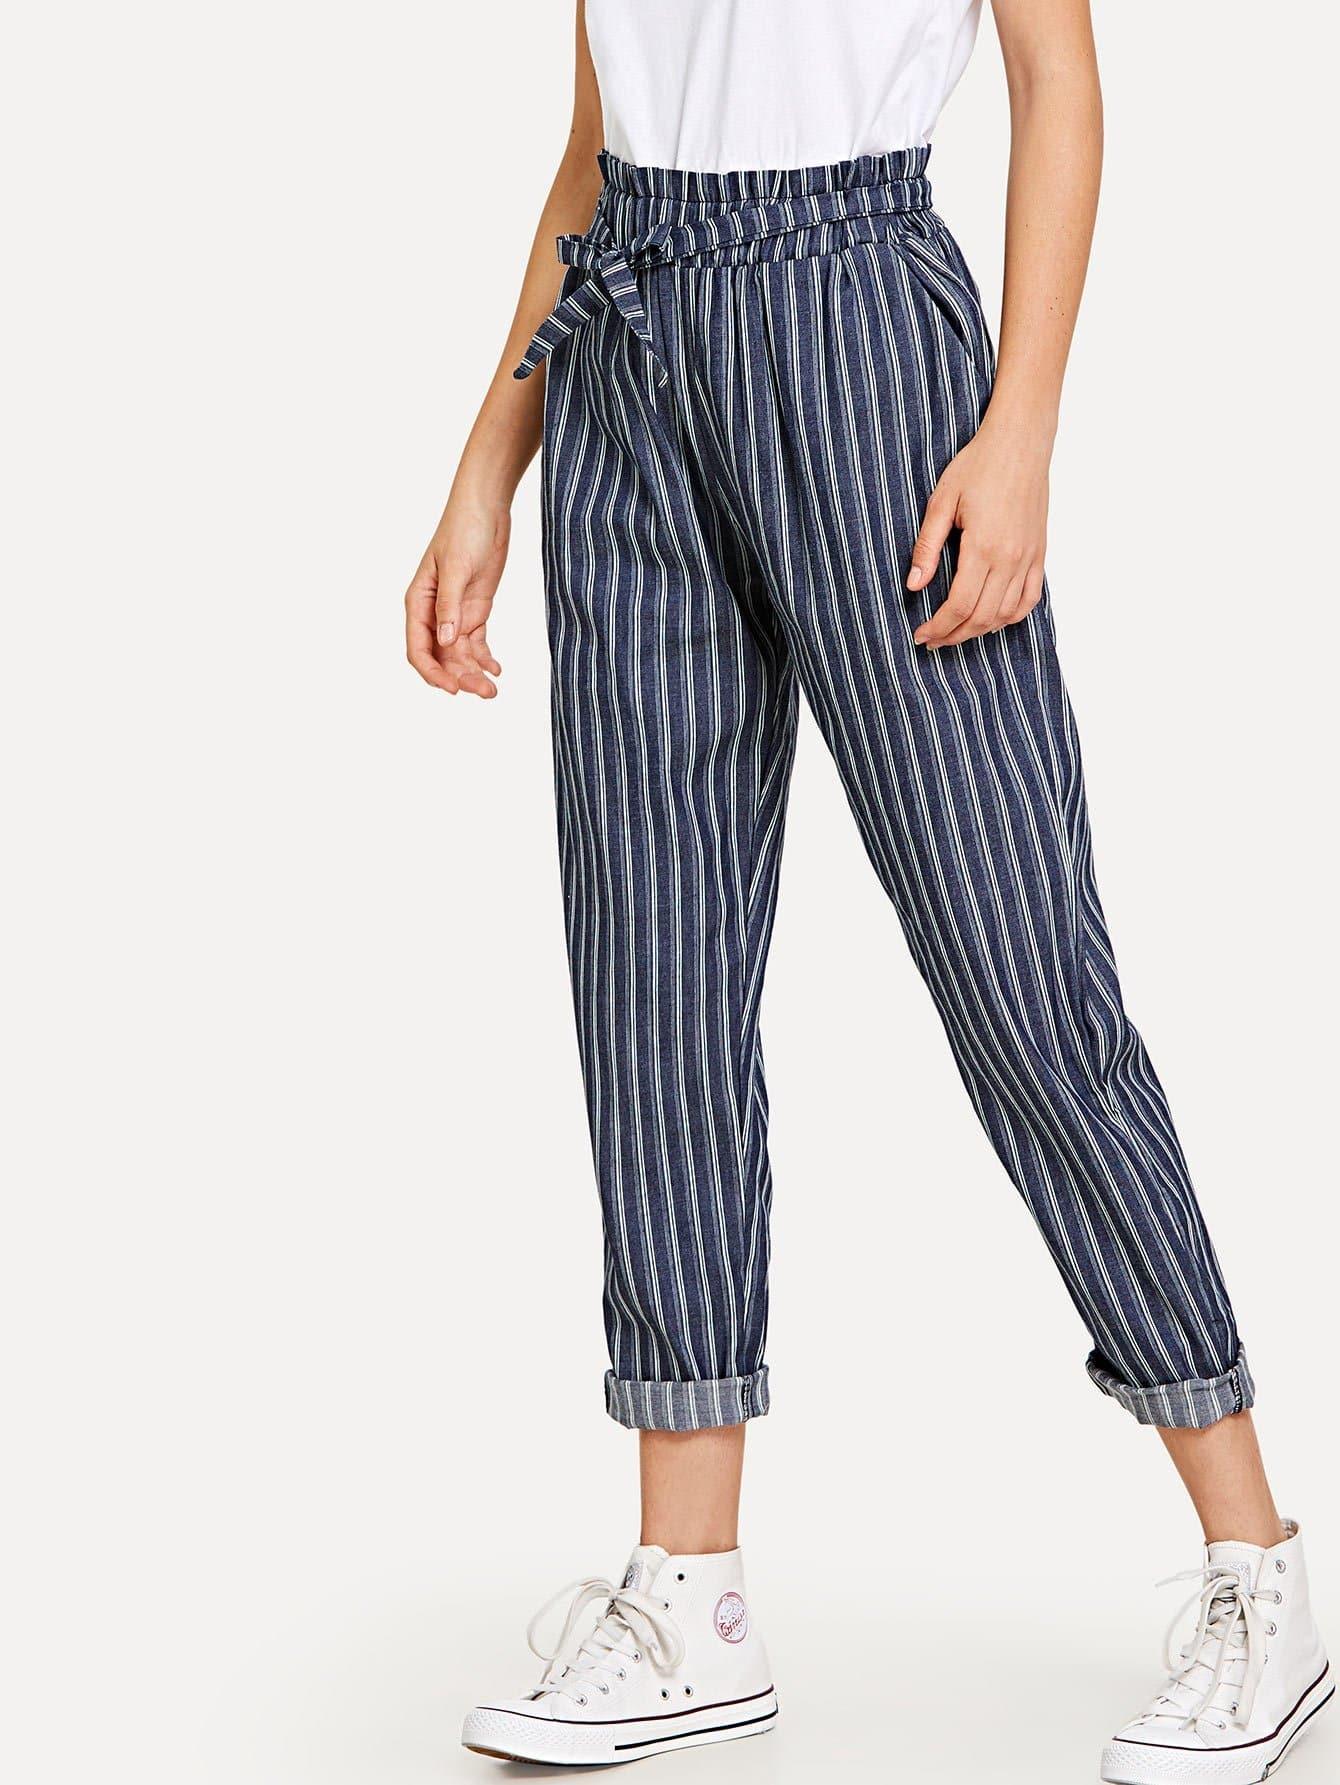 Tie Waist Stripe Pants striped ruffled waist self tie pants